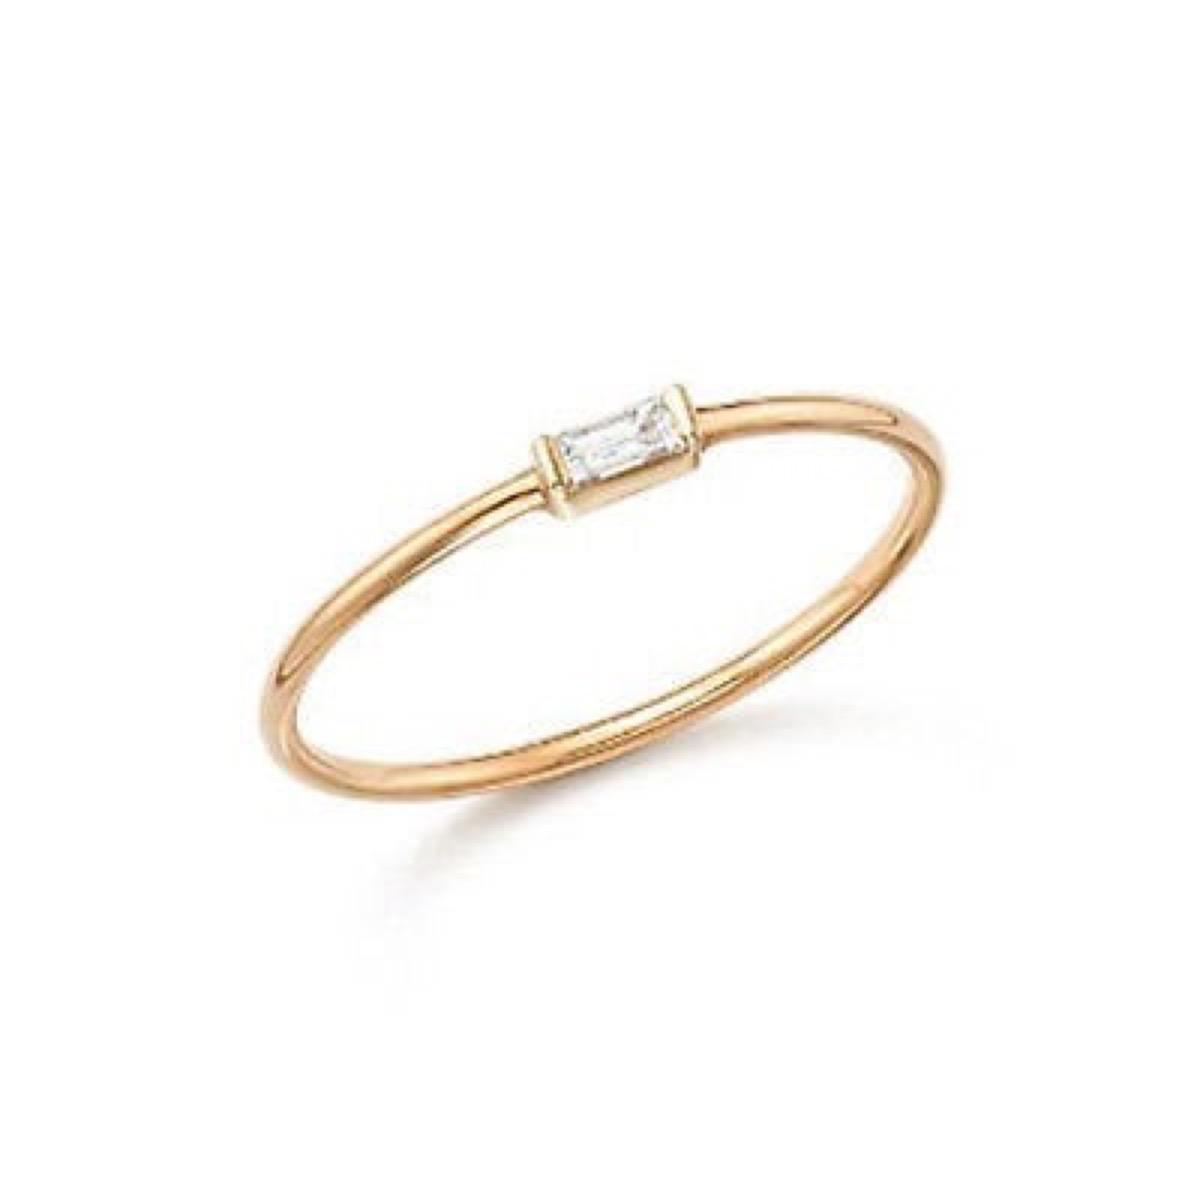 gold band with rectangular diamond, Etsy jewelry